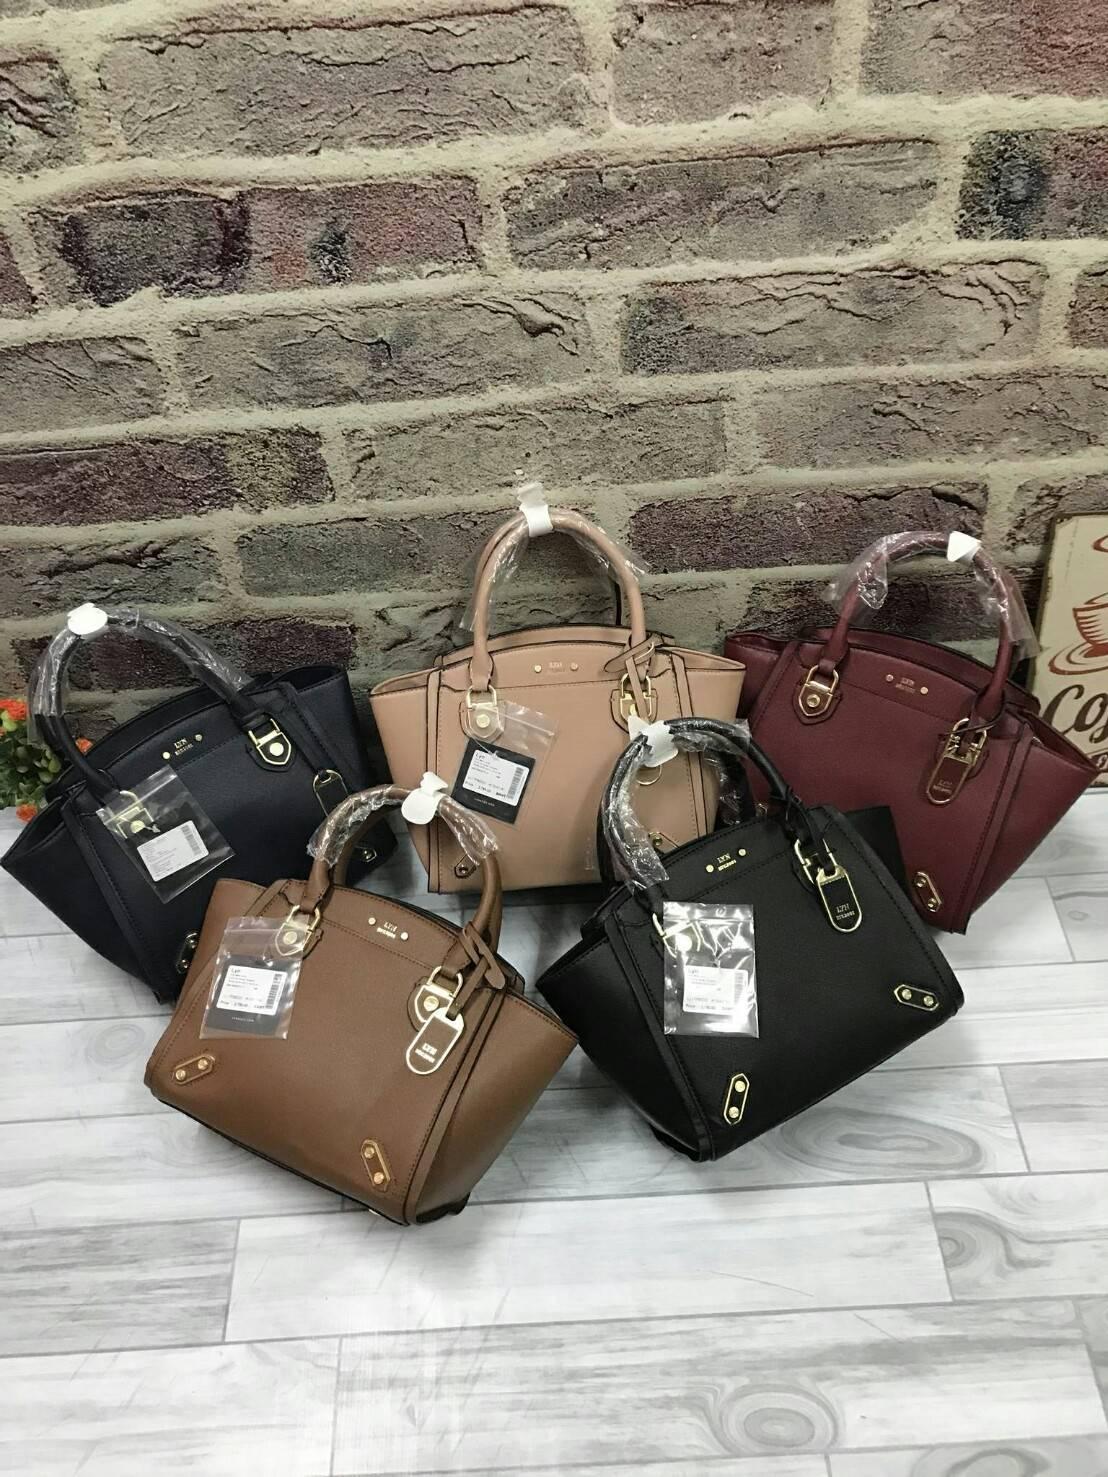 LYN Victory Bag free ถุงแบรนด์